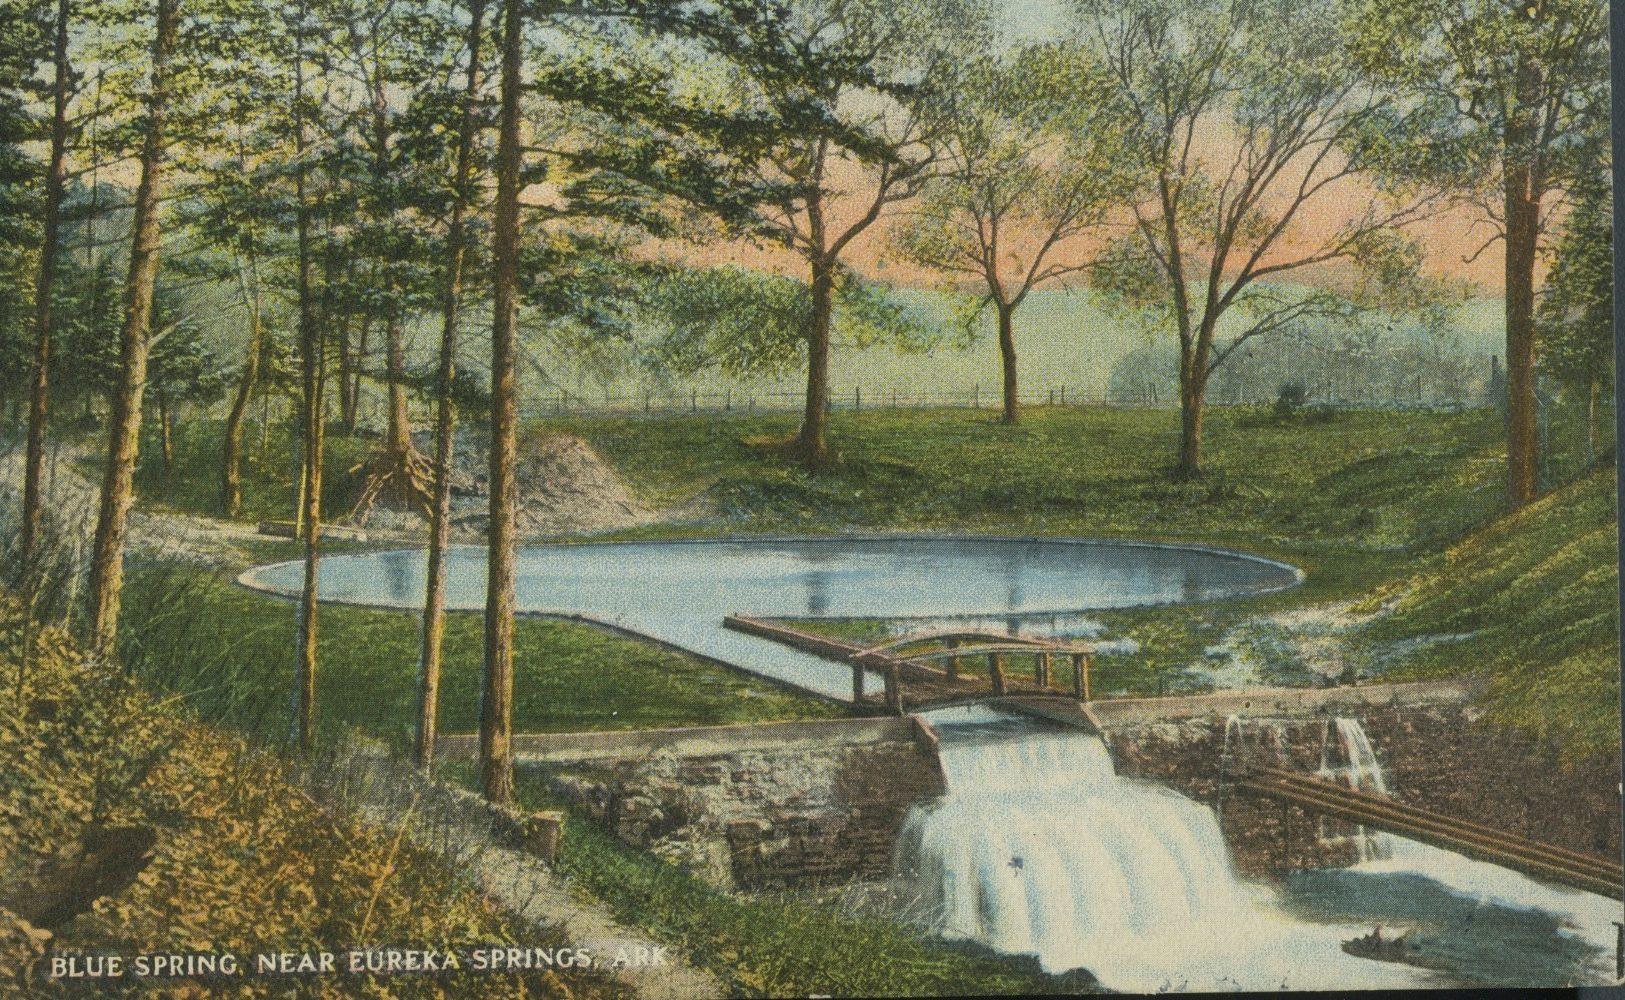 arkansas blue spring eureka springs vintage postcard